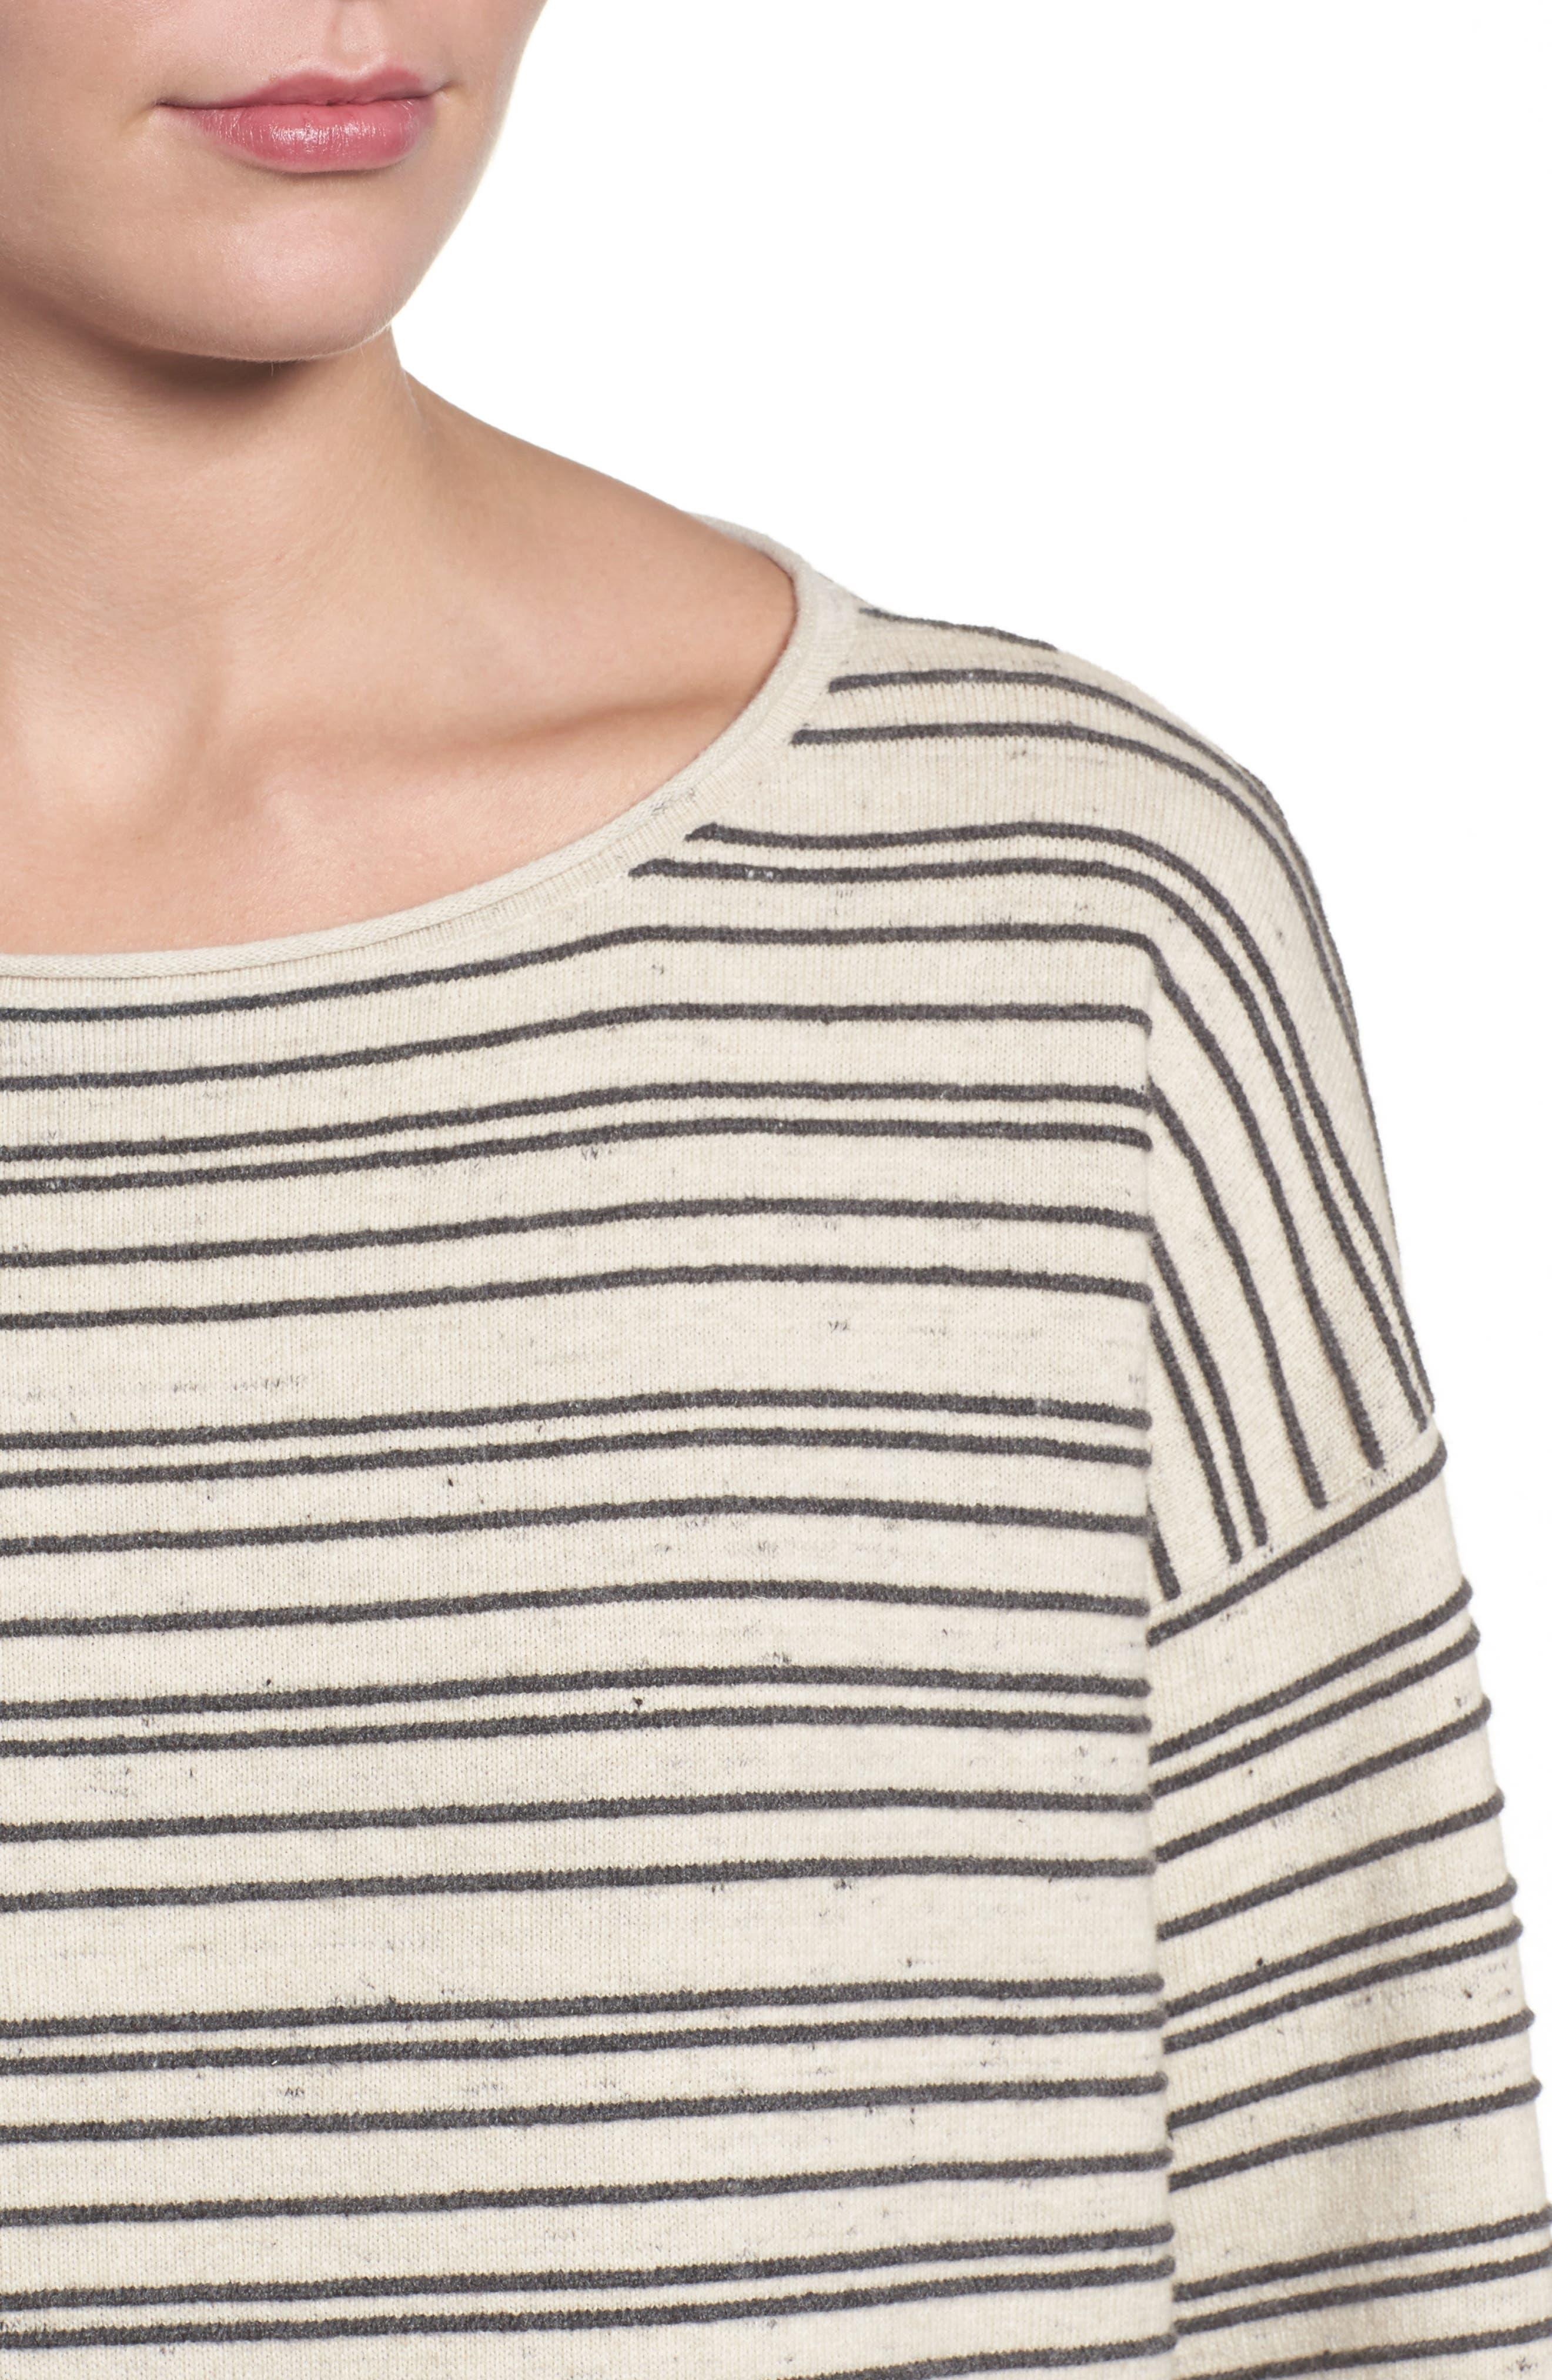 Stripe Organic Cotton Blend Sweater,                             Alternate thumbnail 4, color,                             Maple Oat